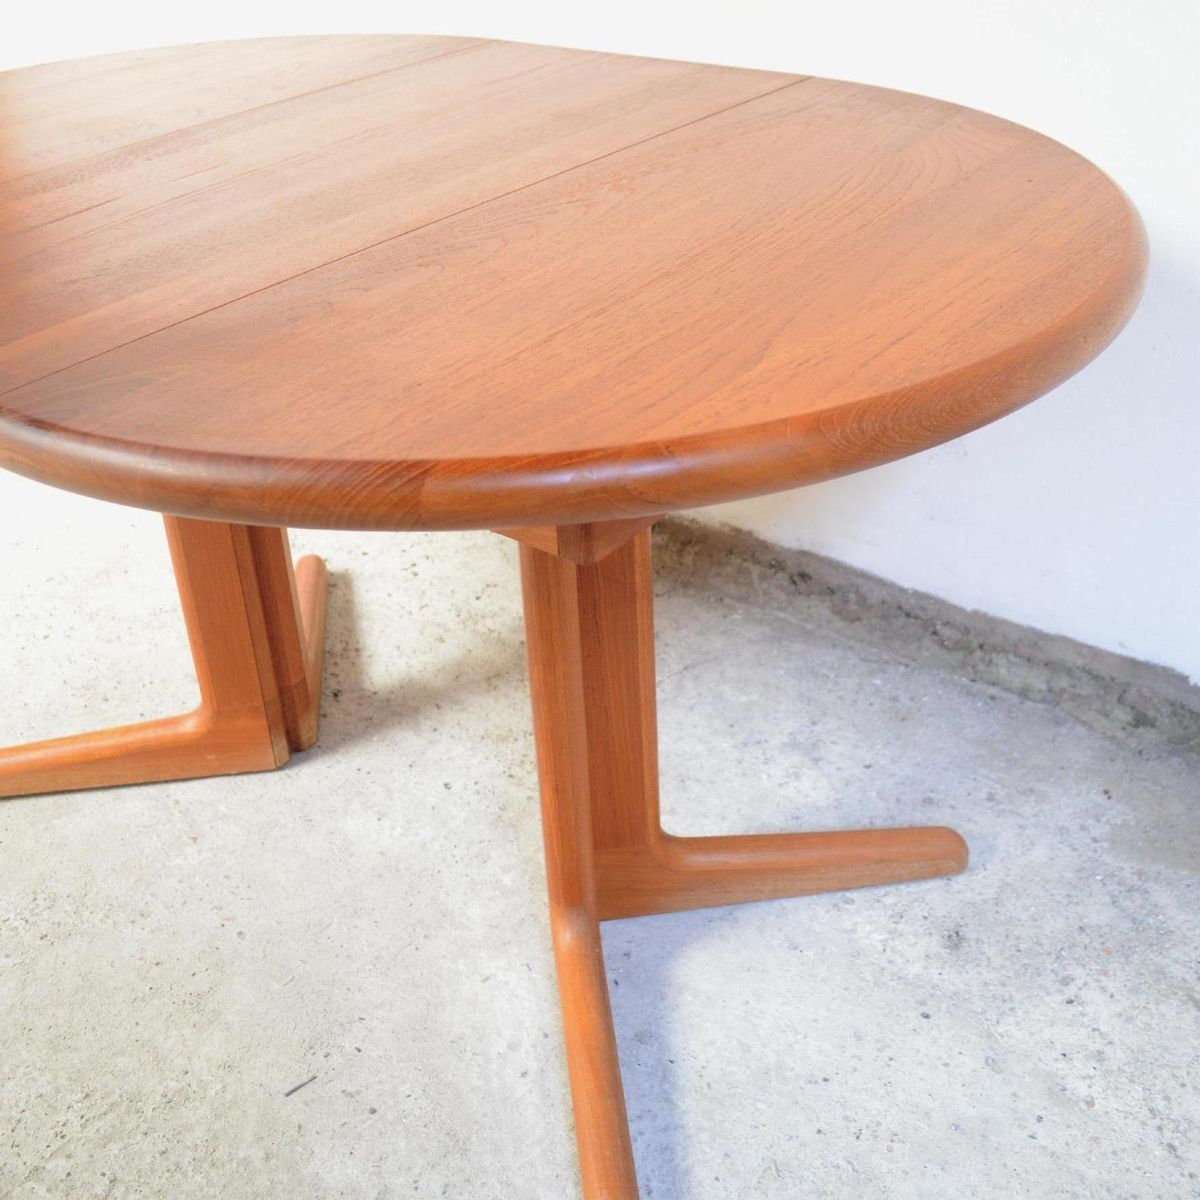 Table de salle manger mid century avec rallonges de for Table de salle a manger design avec rallonge